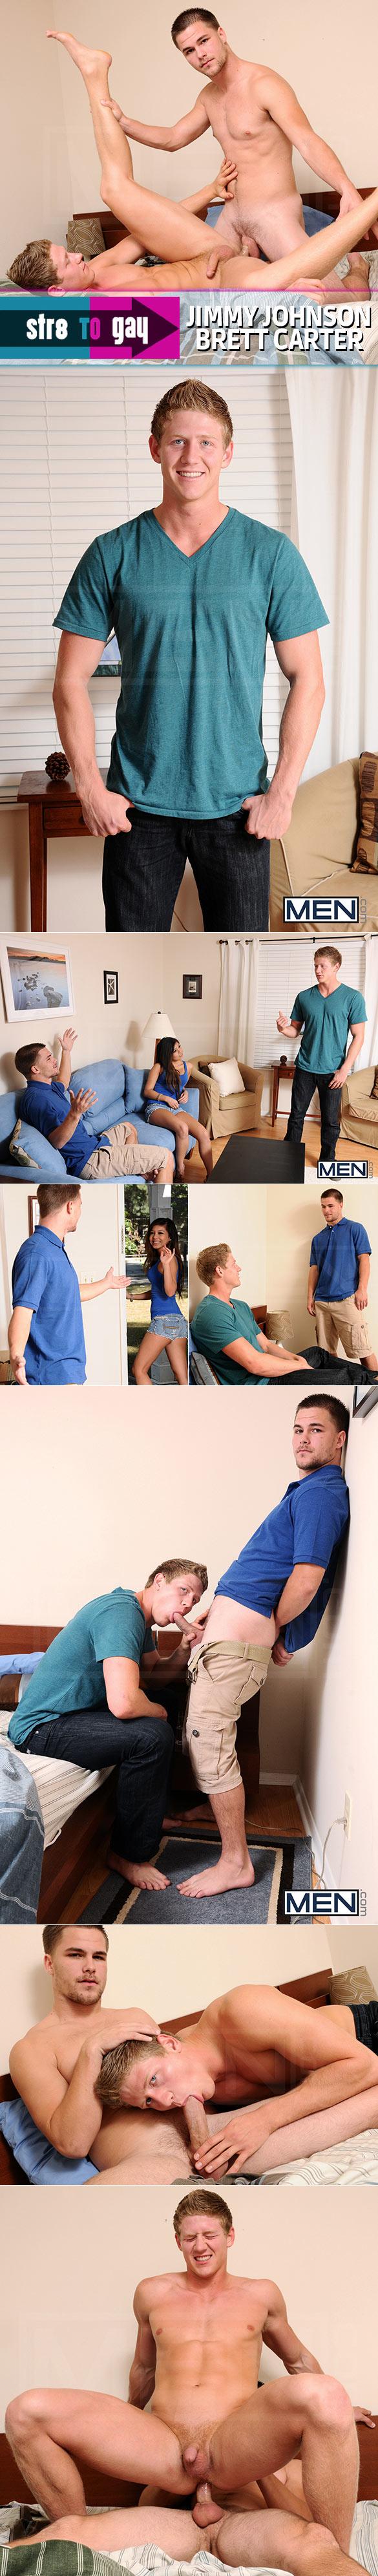 "Men.com: Jimmy Johnson fucks Brett Carter in ""Blocking The Roommate"""